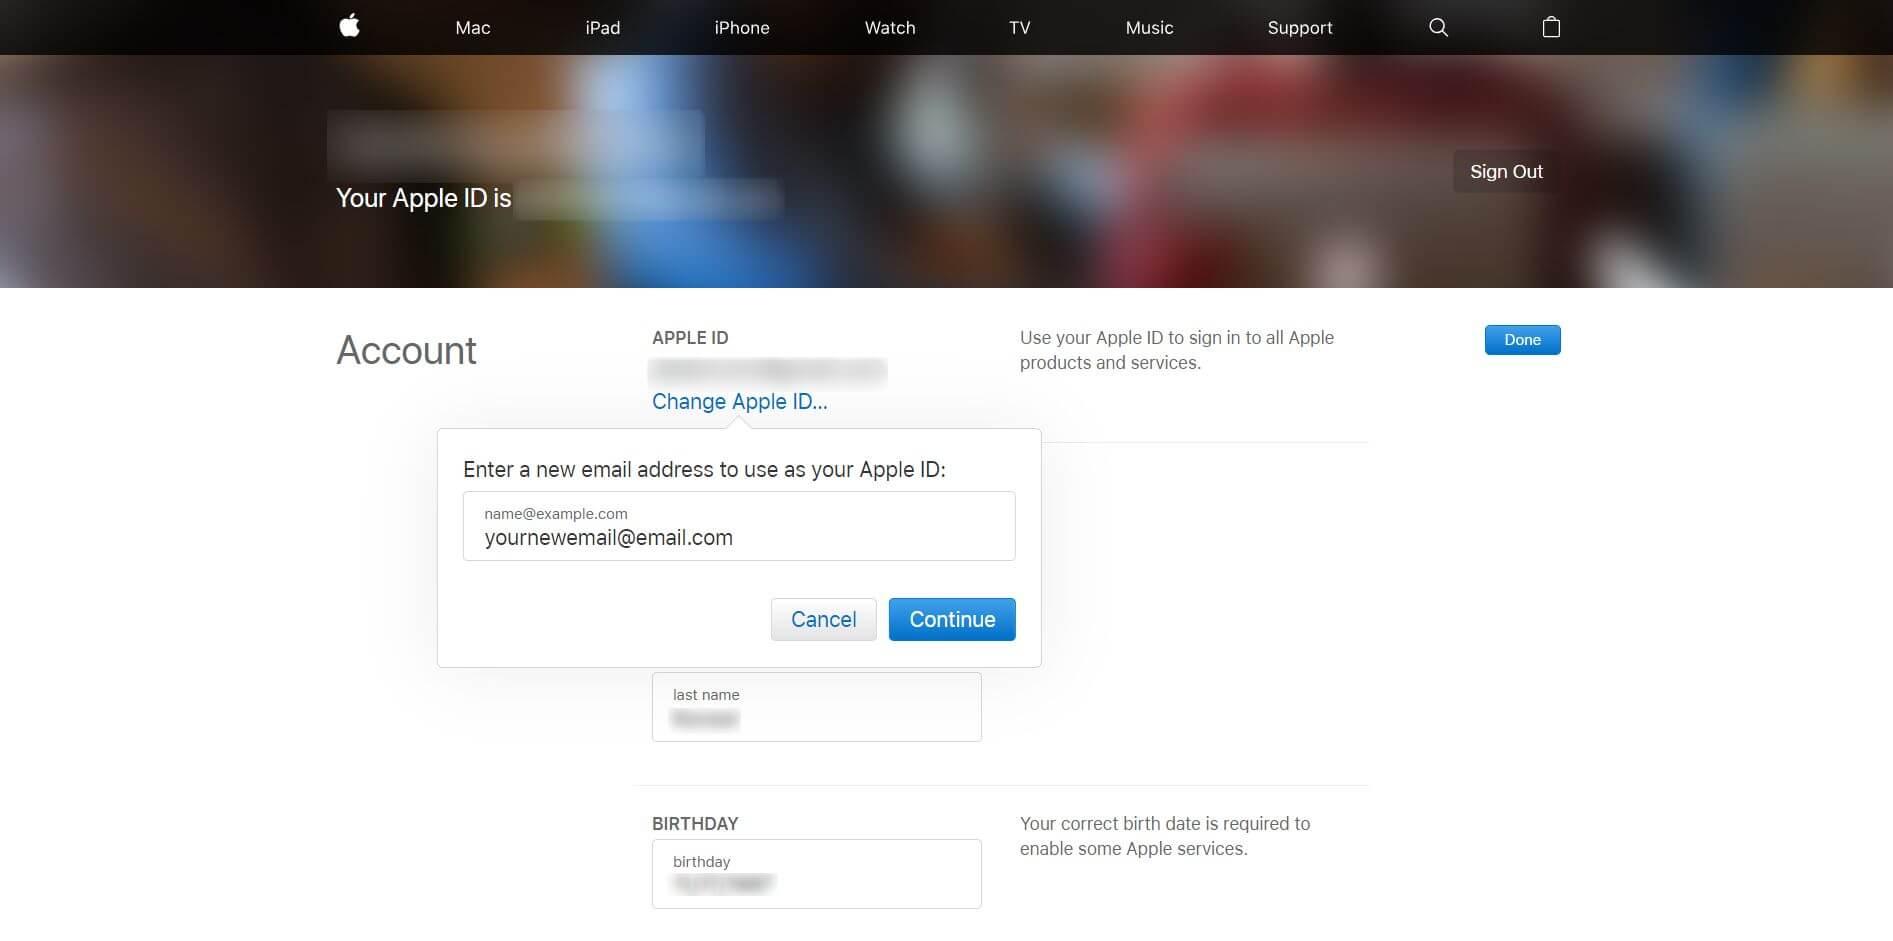 Change Apple ID Email Address